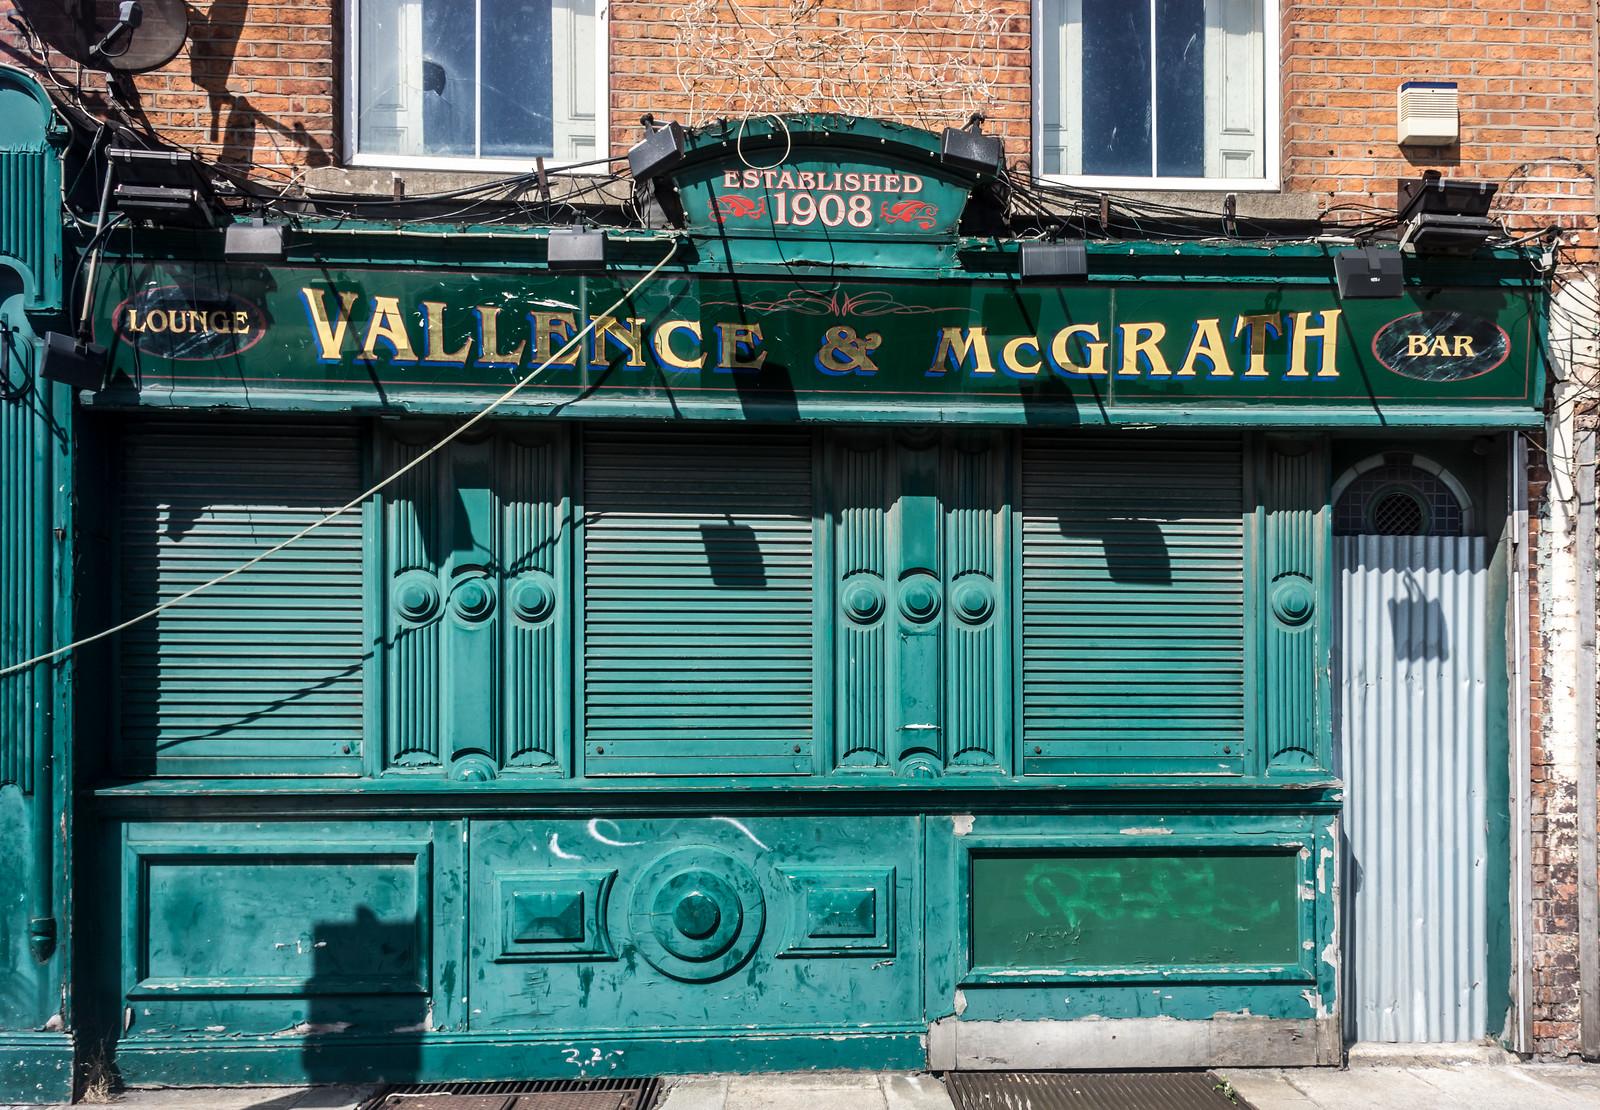 Vallence & McGrath - Established In 1908 But No Longer In Business